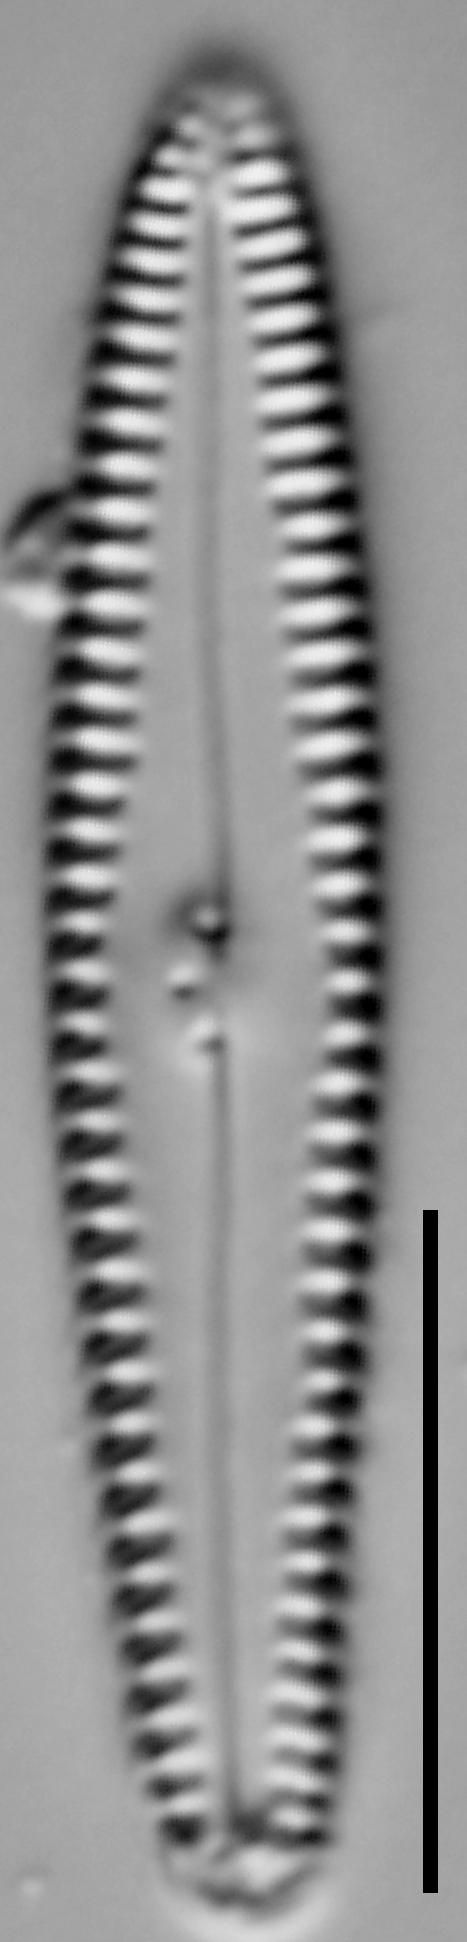 G Caperatum 15558A 08132015 56 Cl